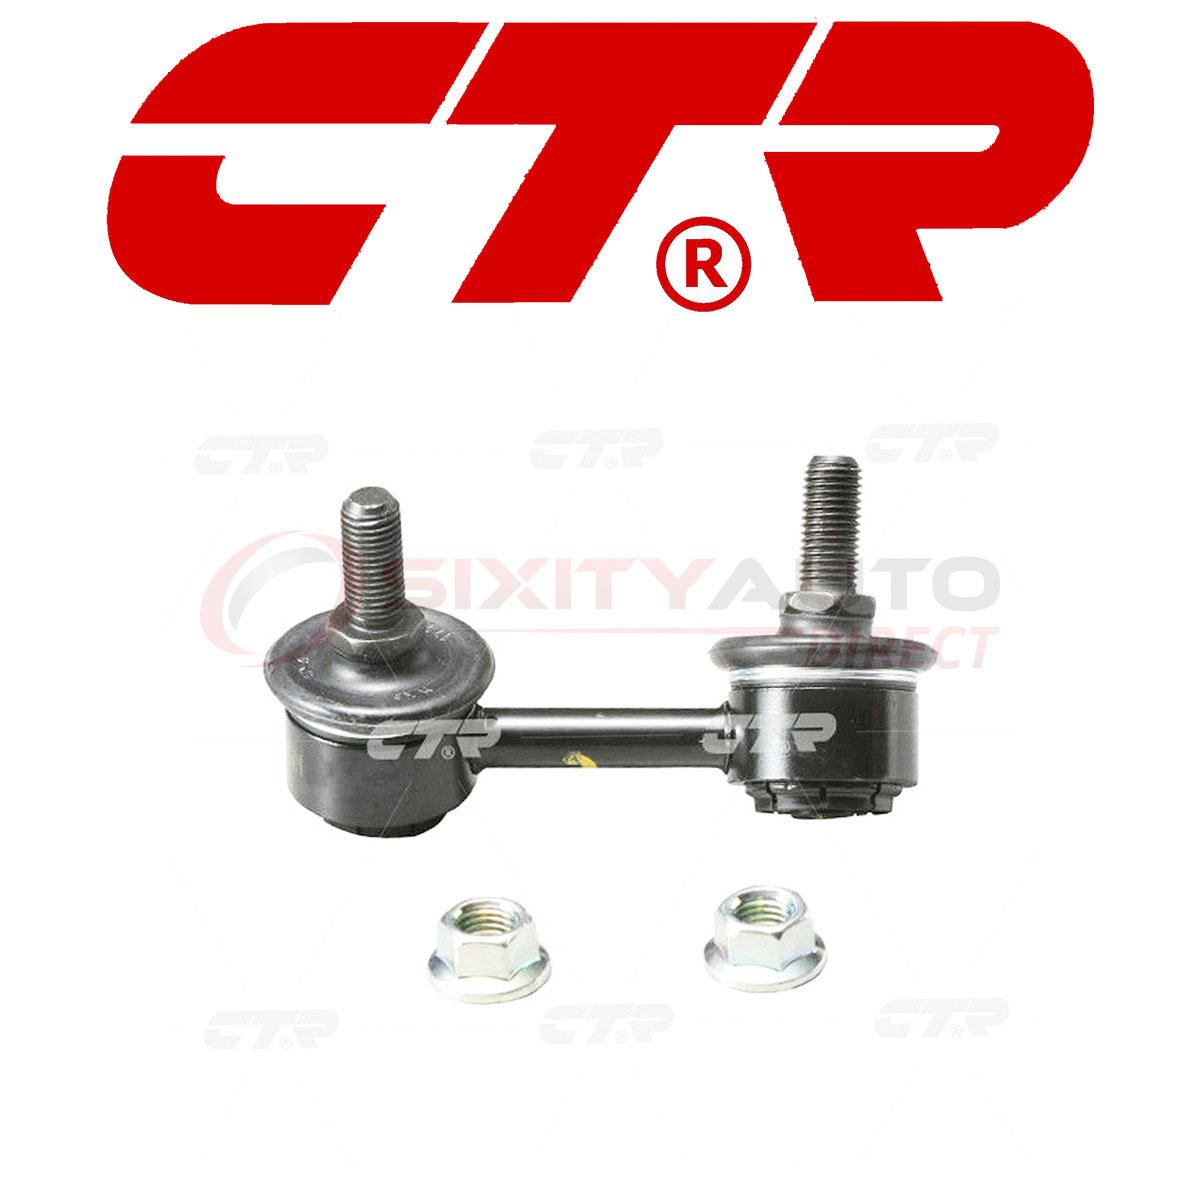 CTR Suspension Stabilizer Bar Link Repair Kit For 1999